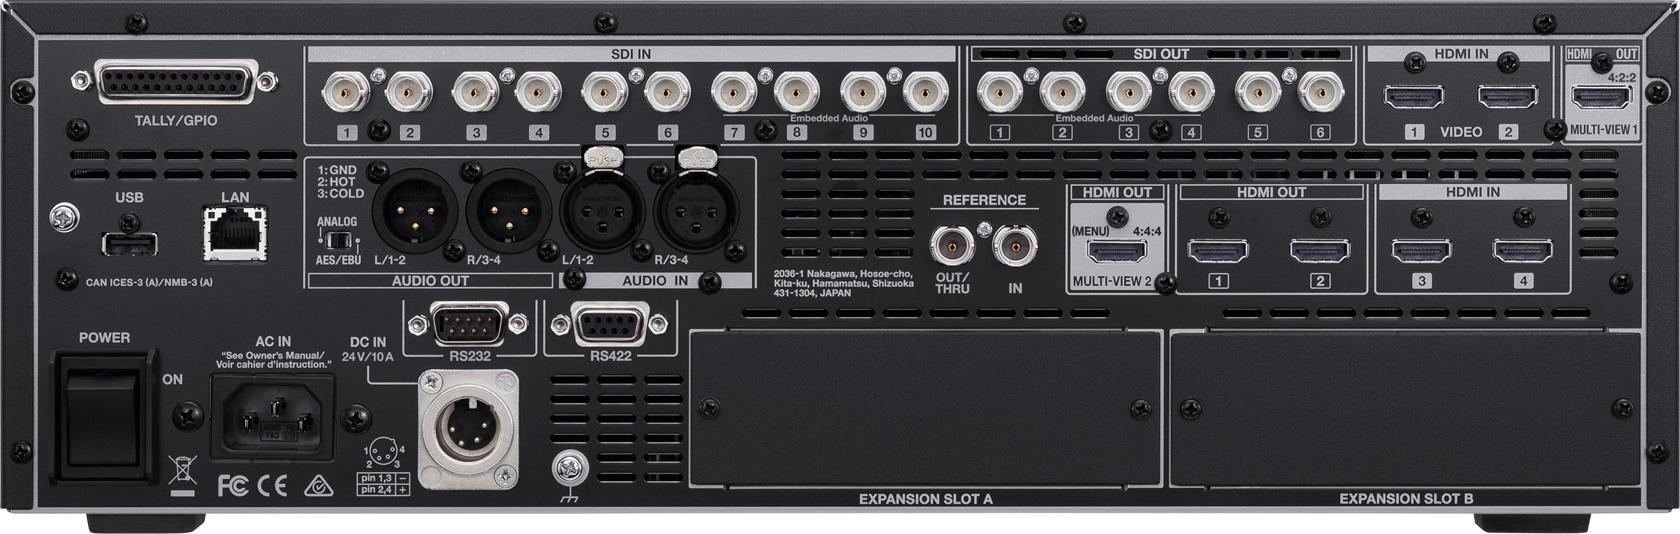 V-1200HD - News